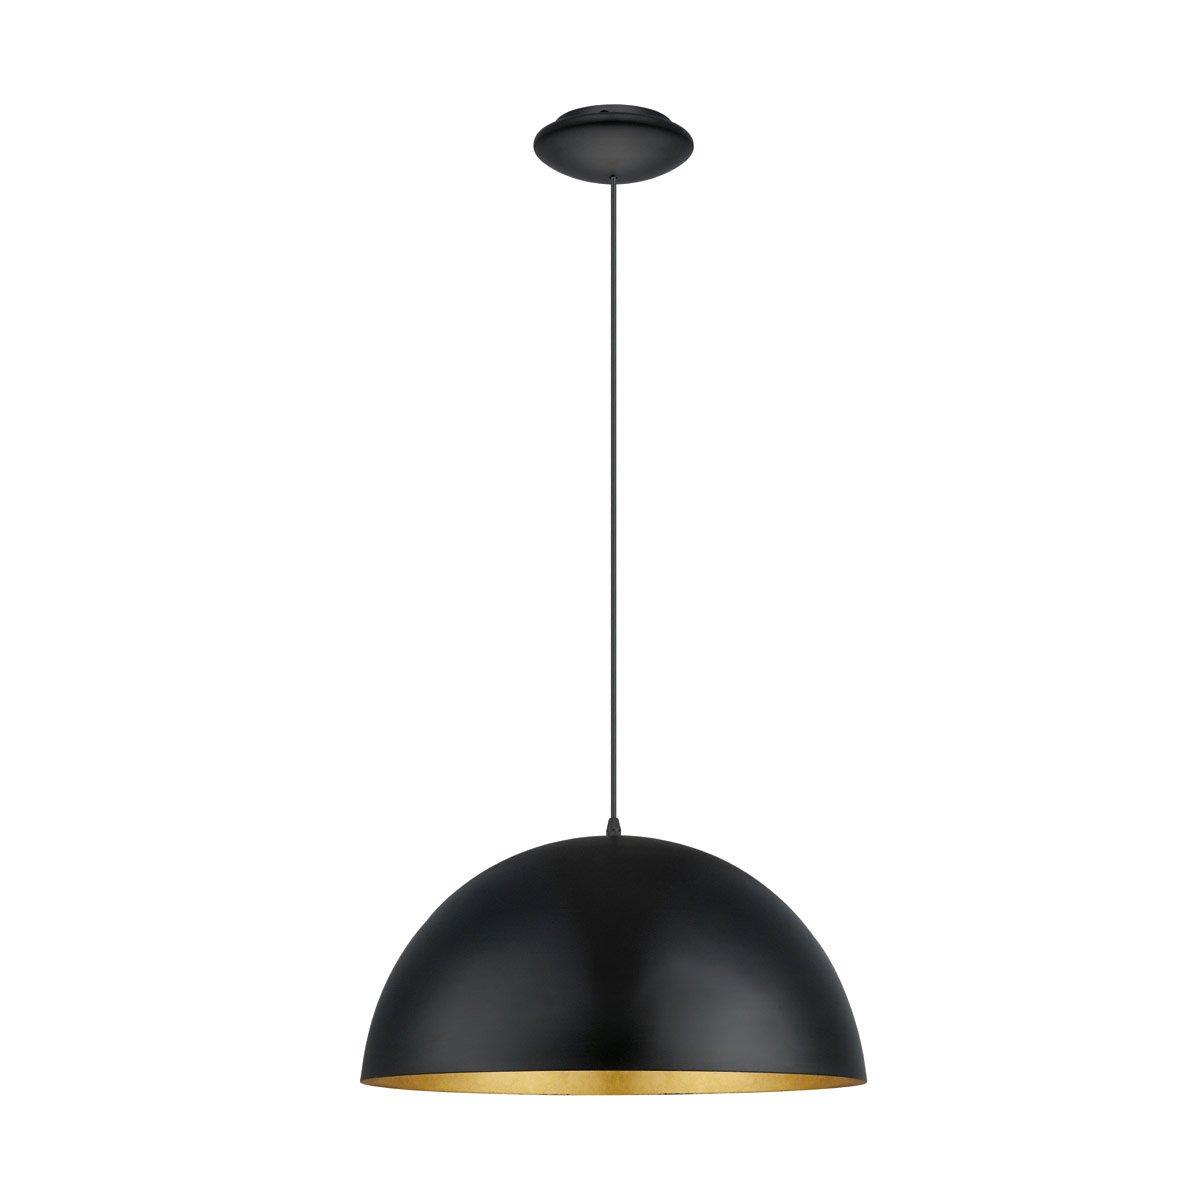 Eglo Hanglamp Gaetano 1 zwart - goud Eglo 94936